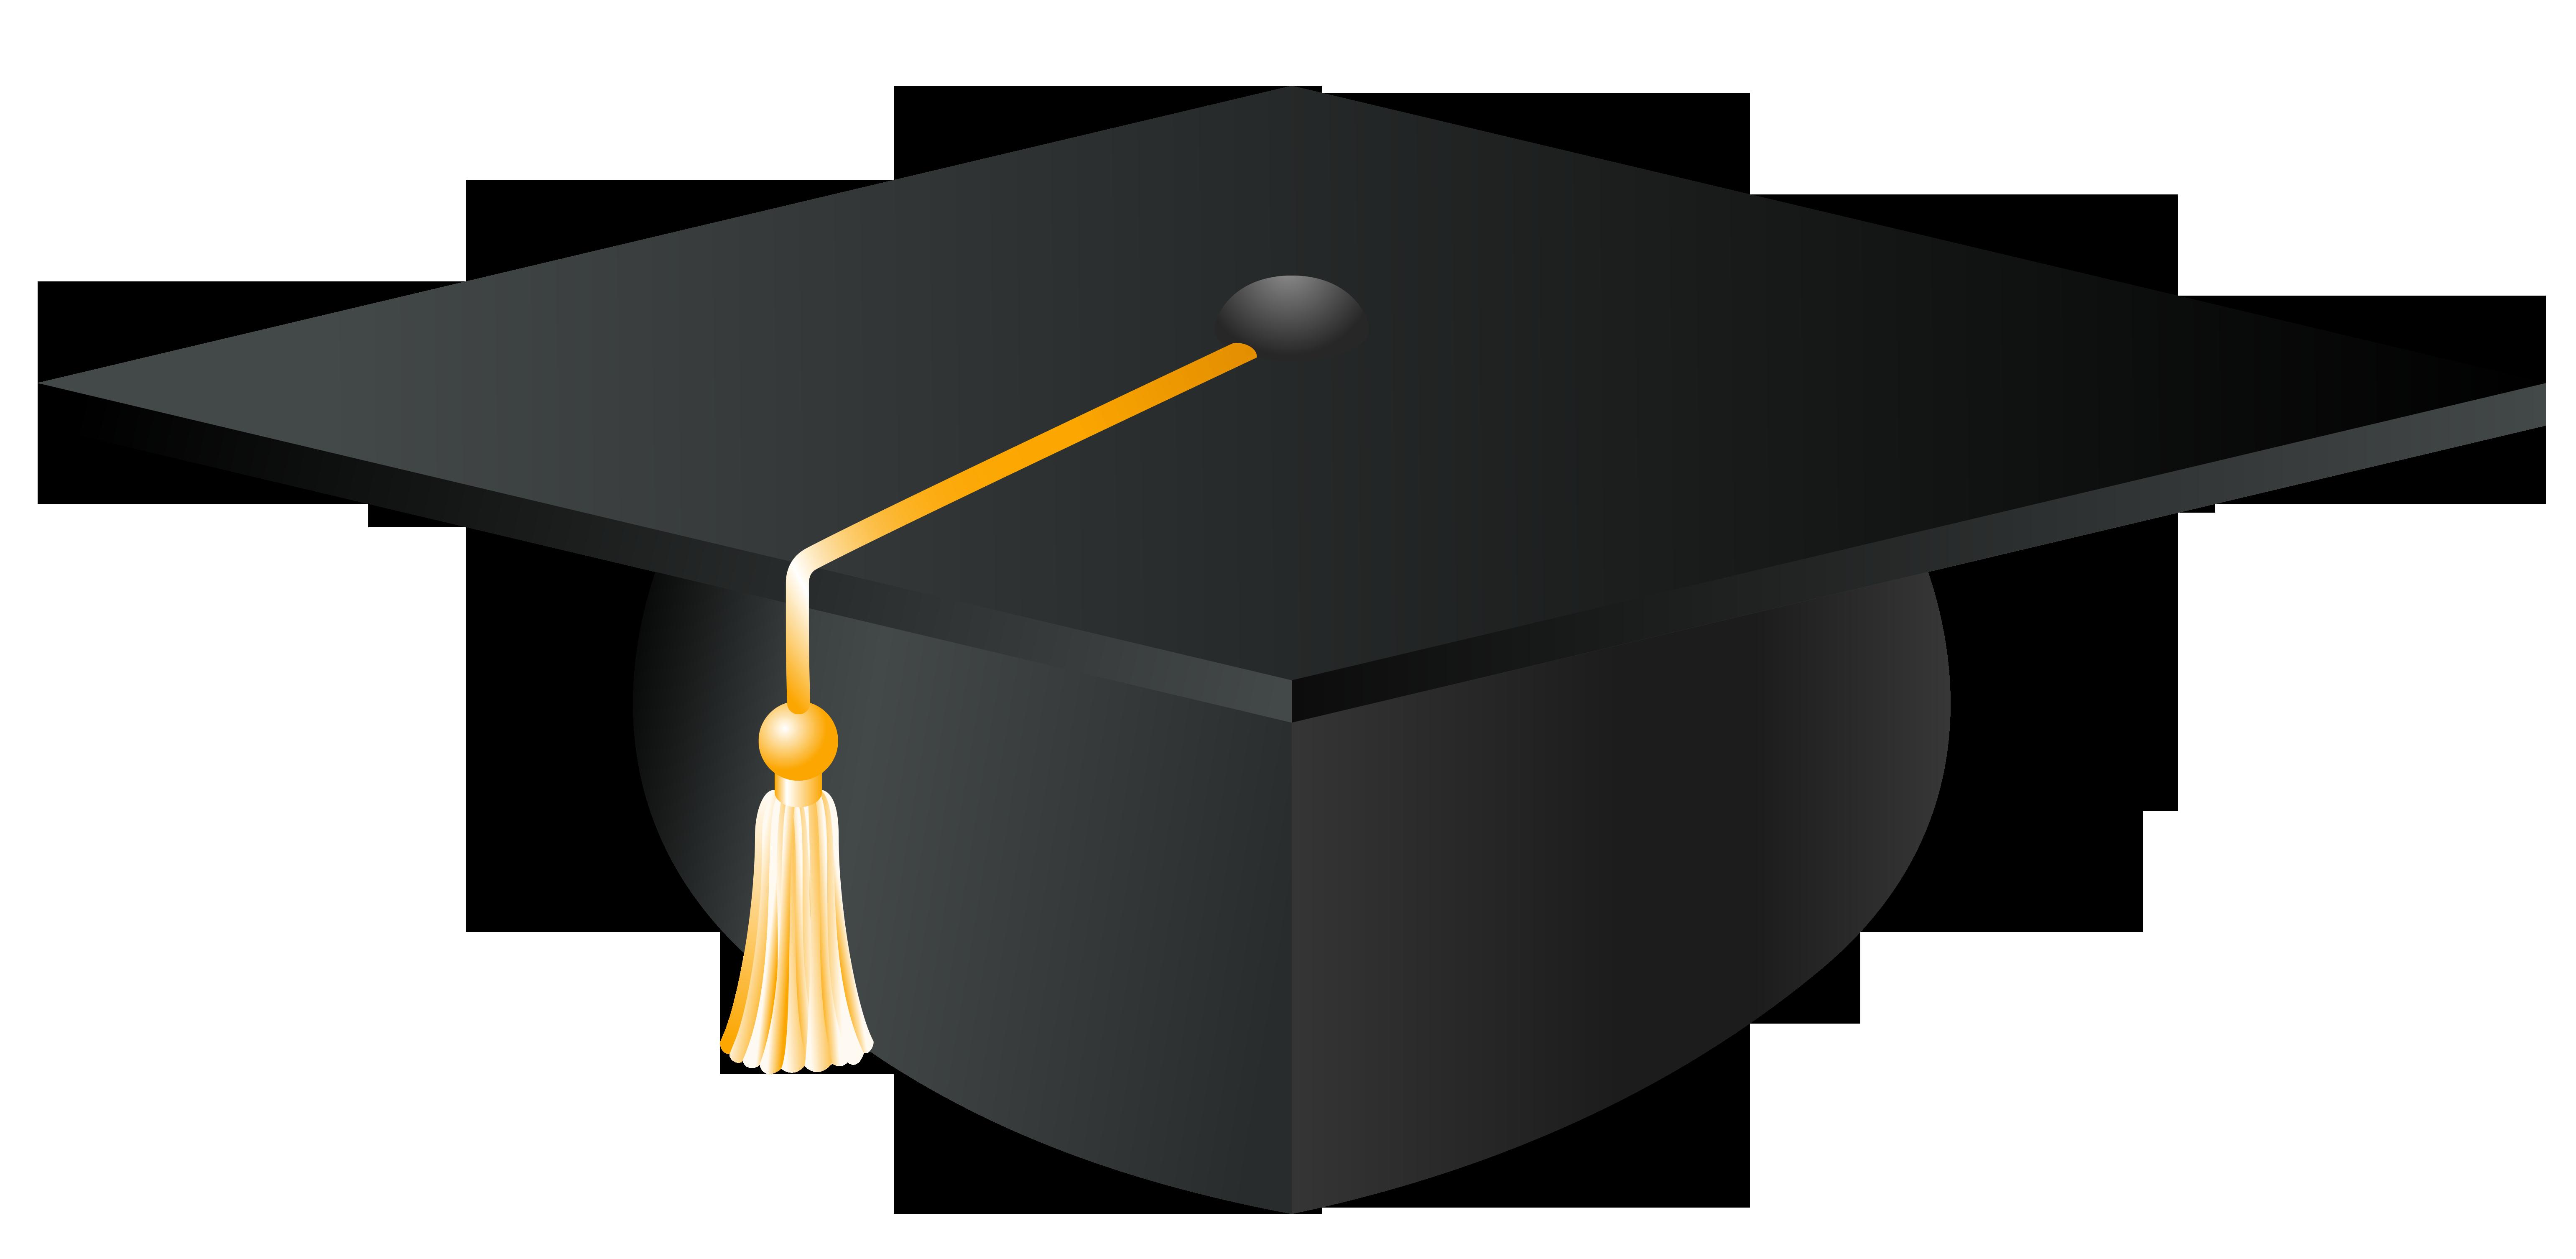 6162x3011 Graduation Hat Gold Graduation Cap Clip Art Pictures To Pin